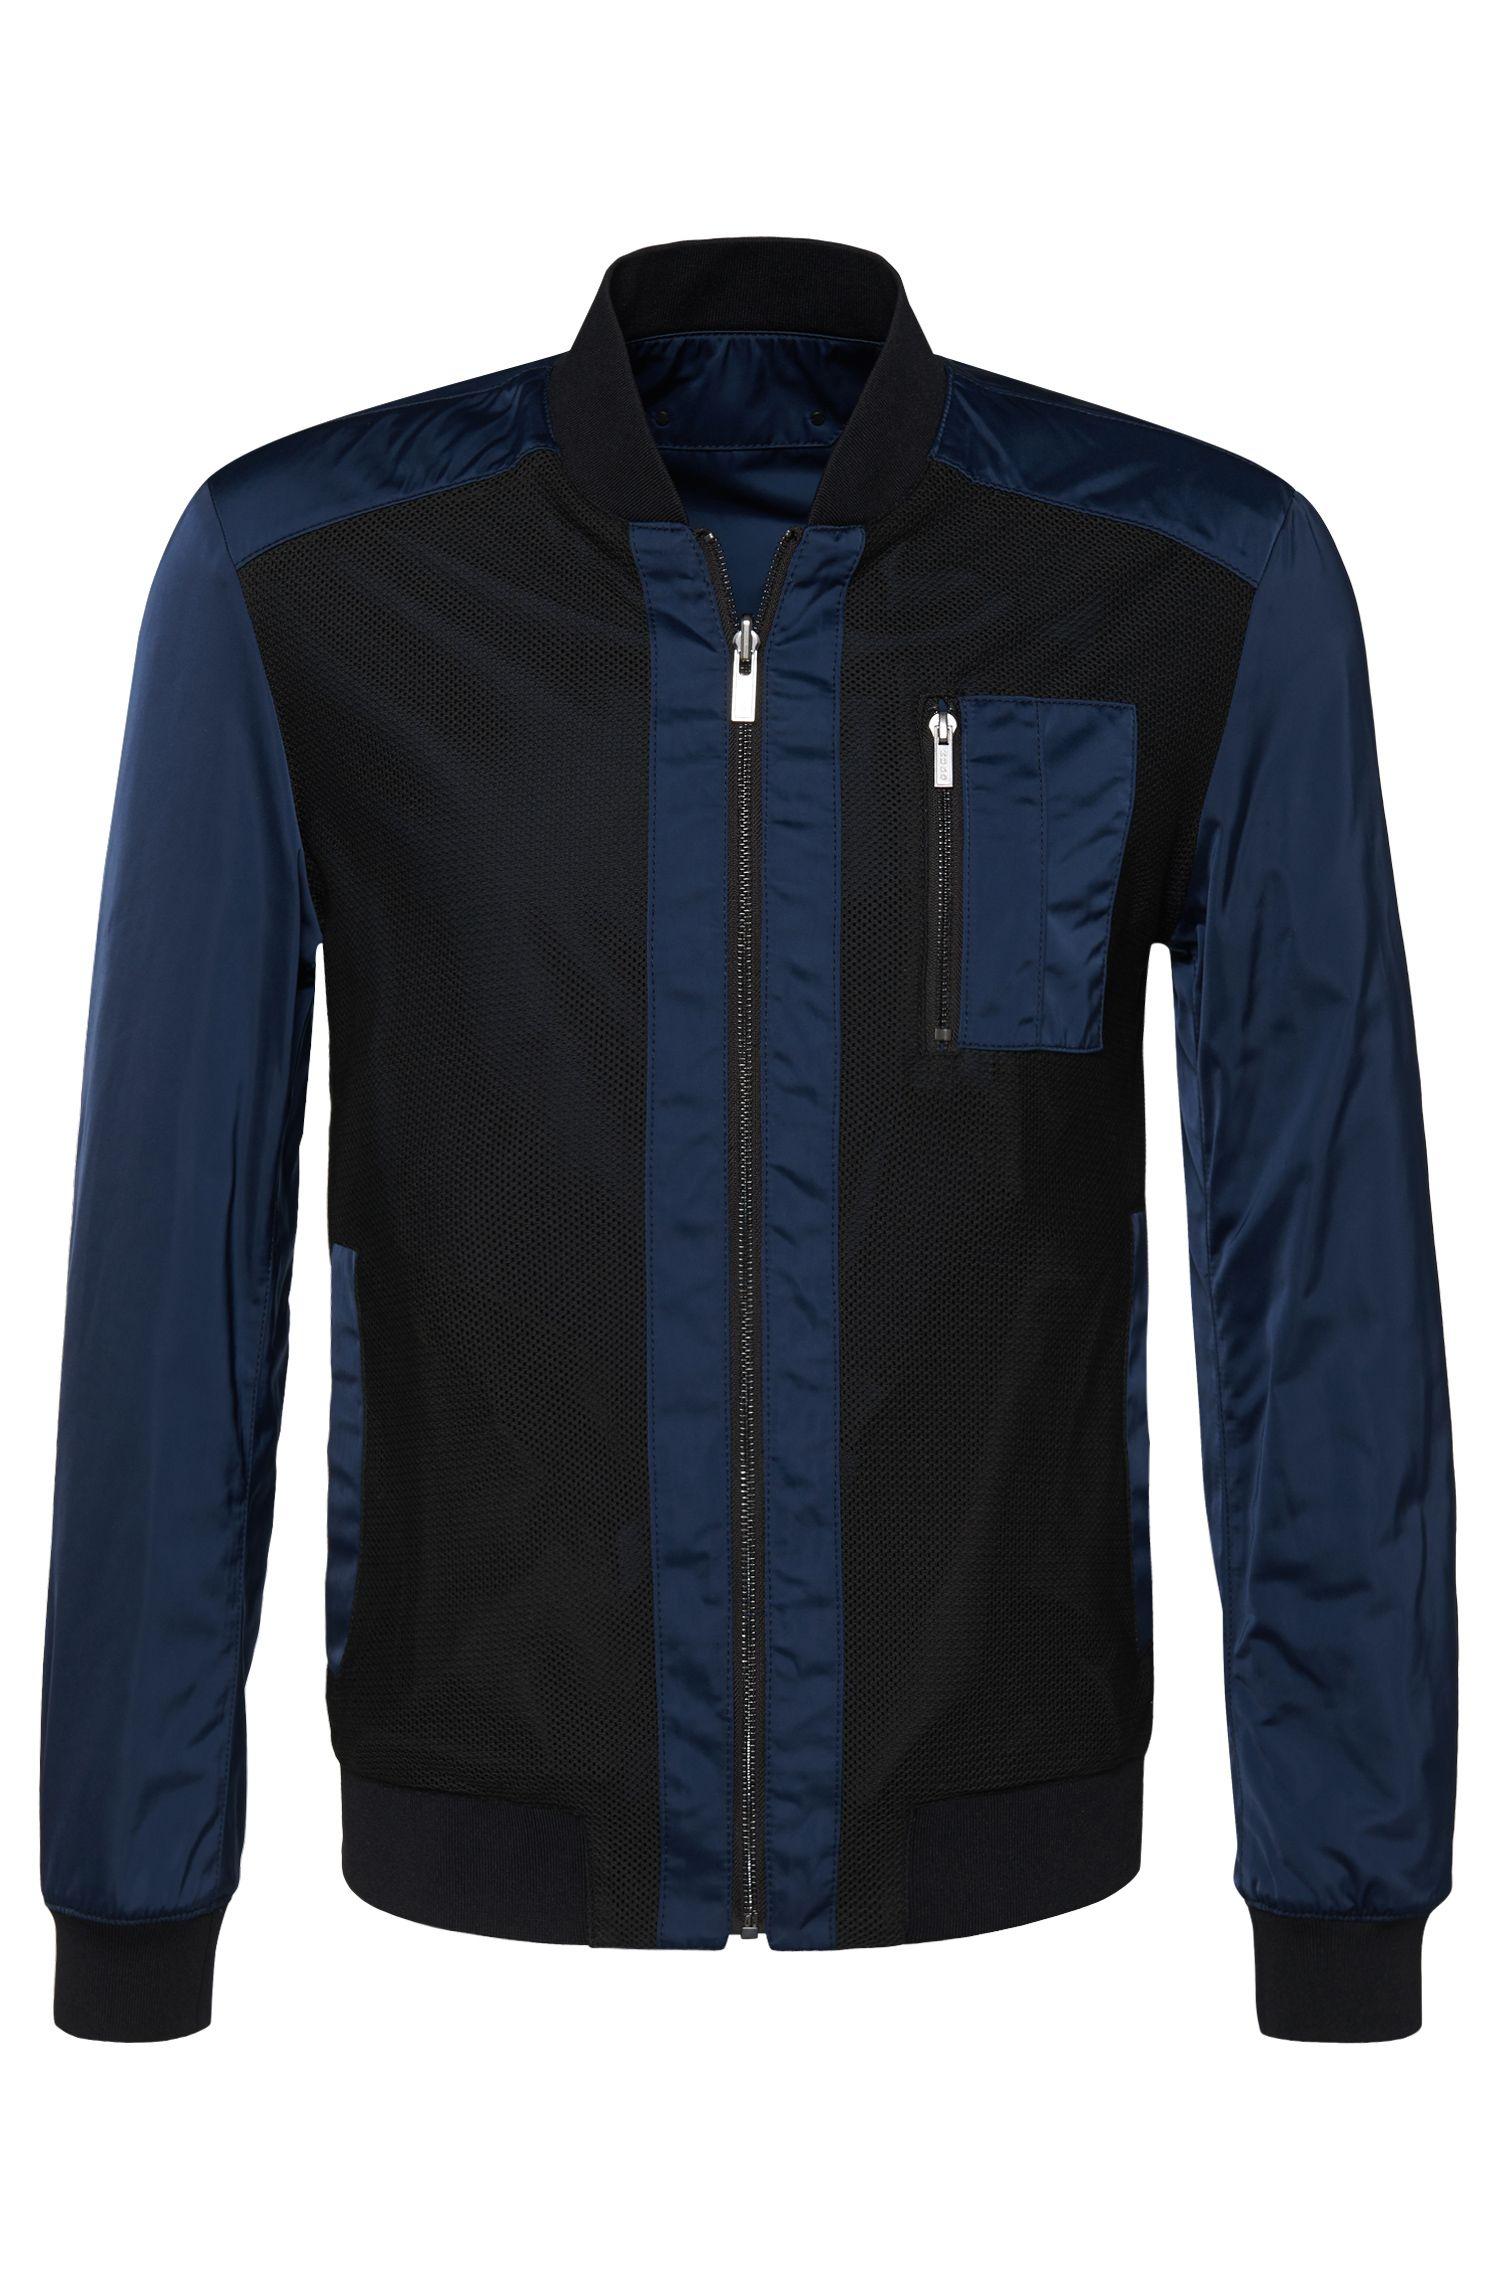 'Baxent' | Reversible Water-Repellent Varsity Jacket